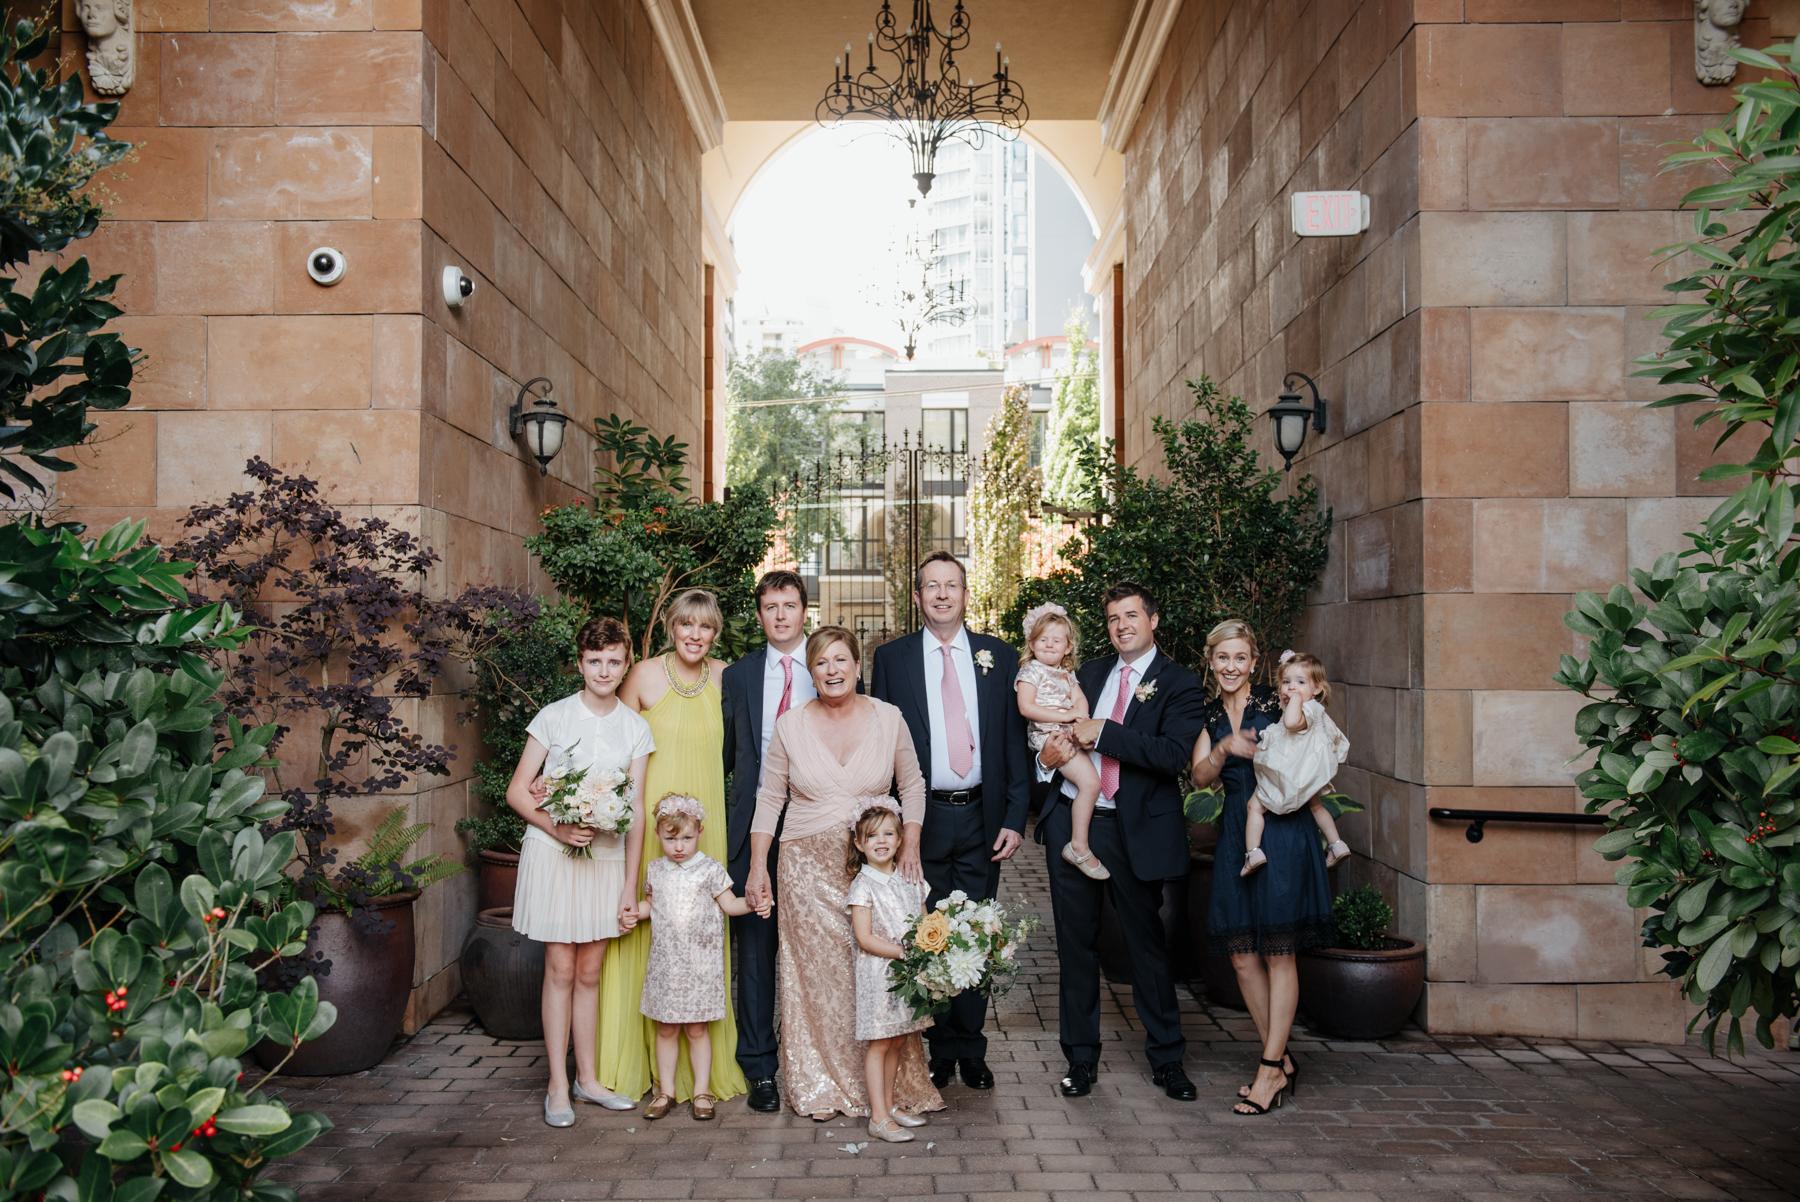 kaoverii_silva_photographer_cynthia_richard_wedding_vancouver_brix_&_mortar-9.jpg